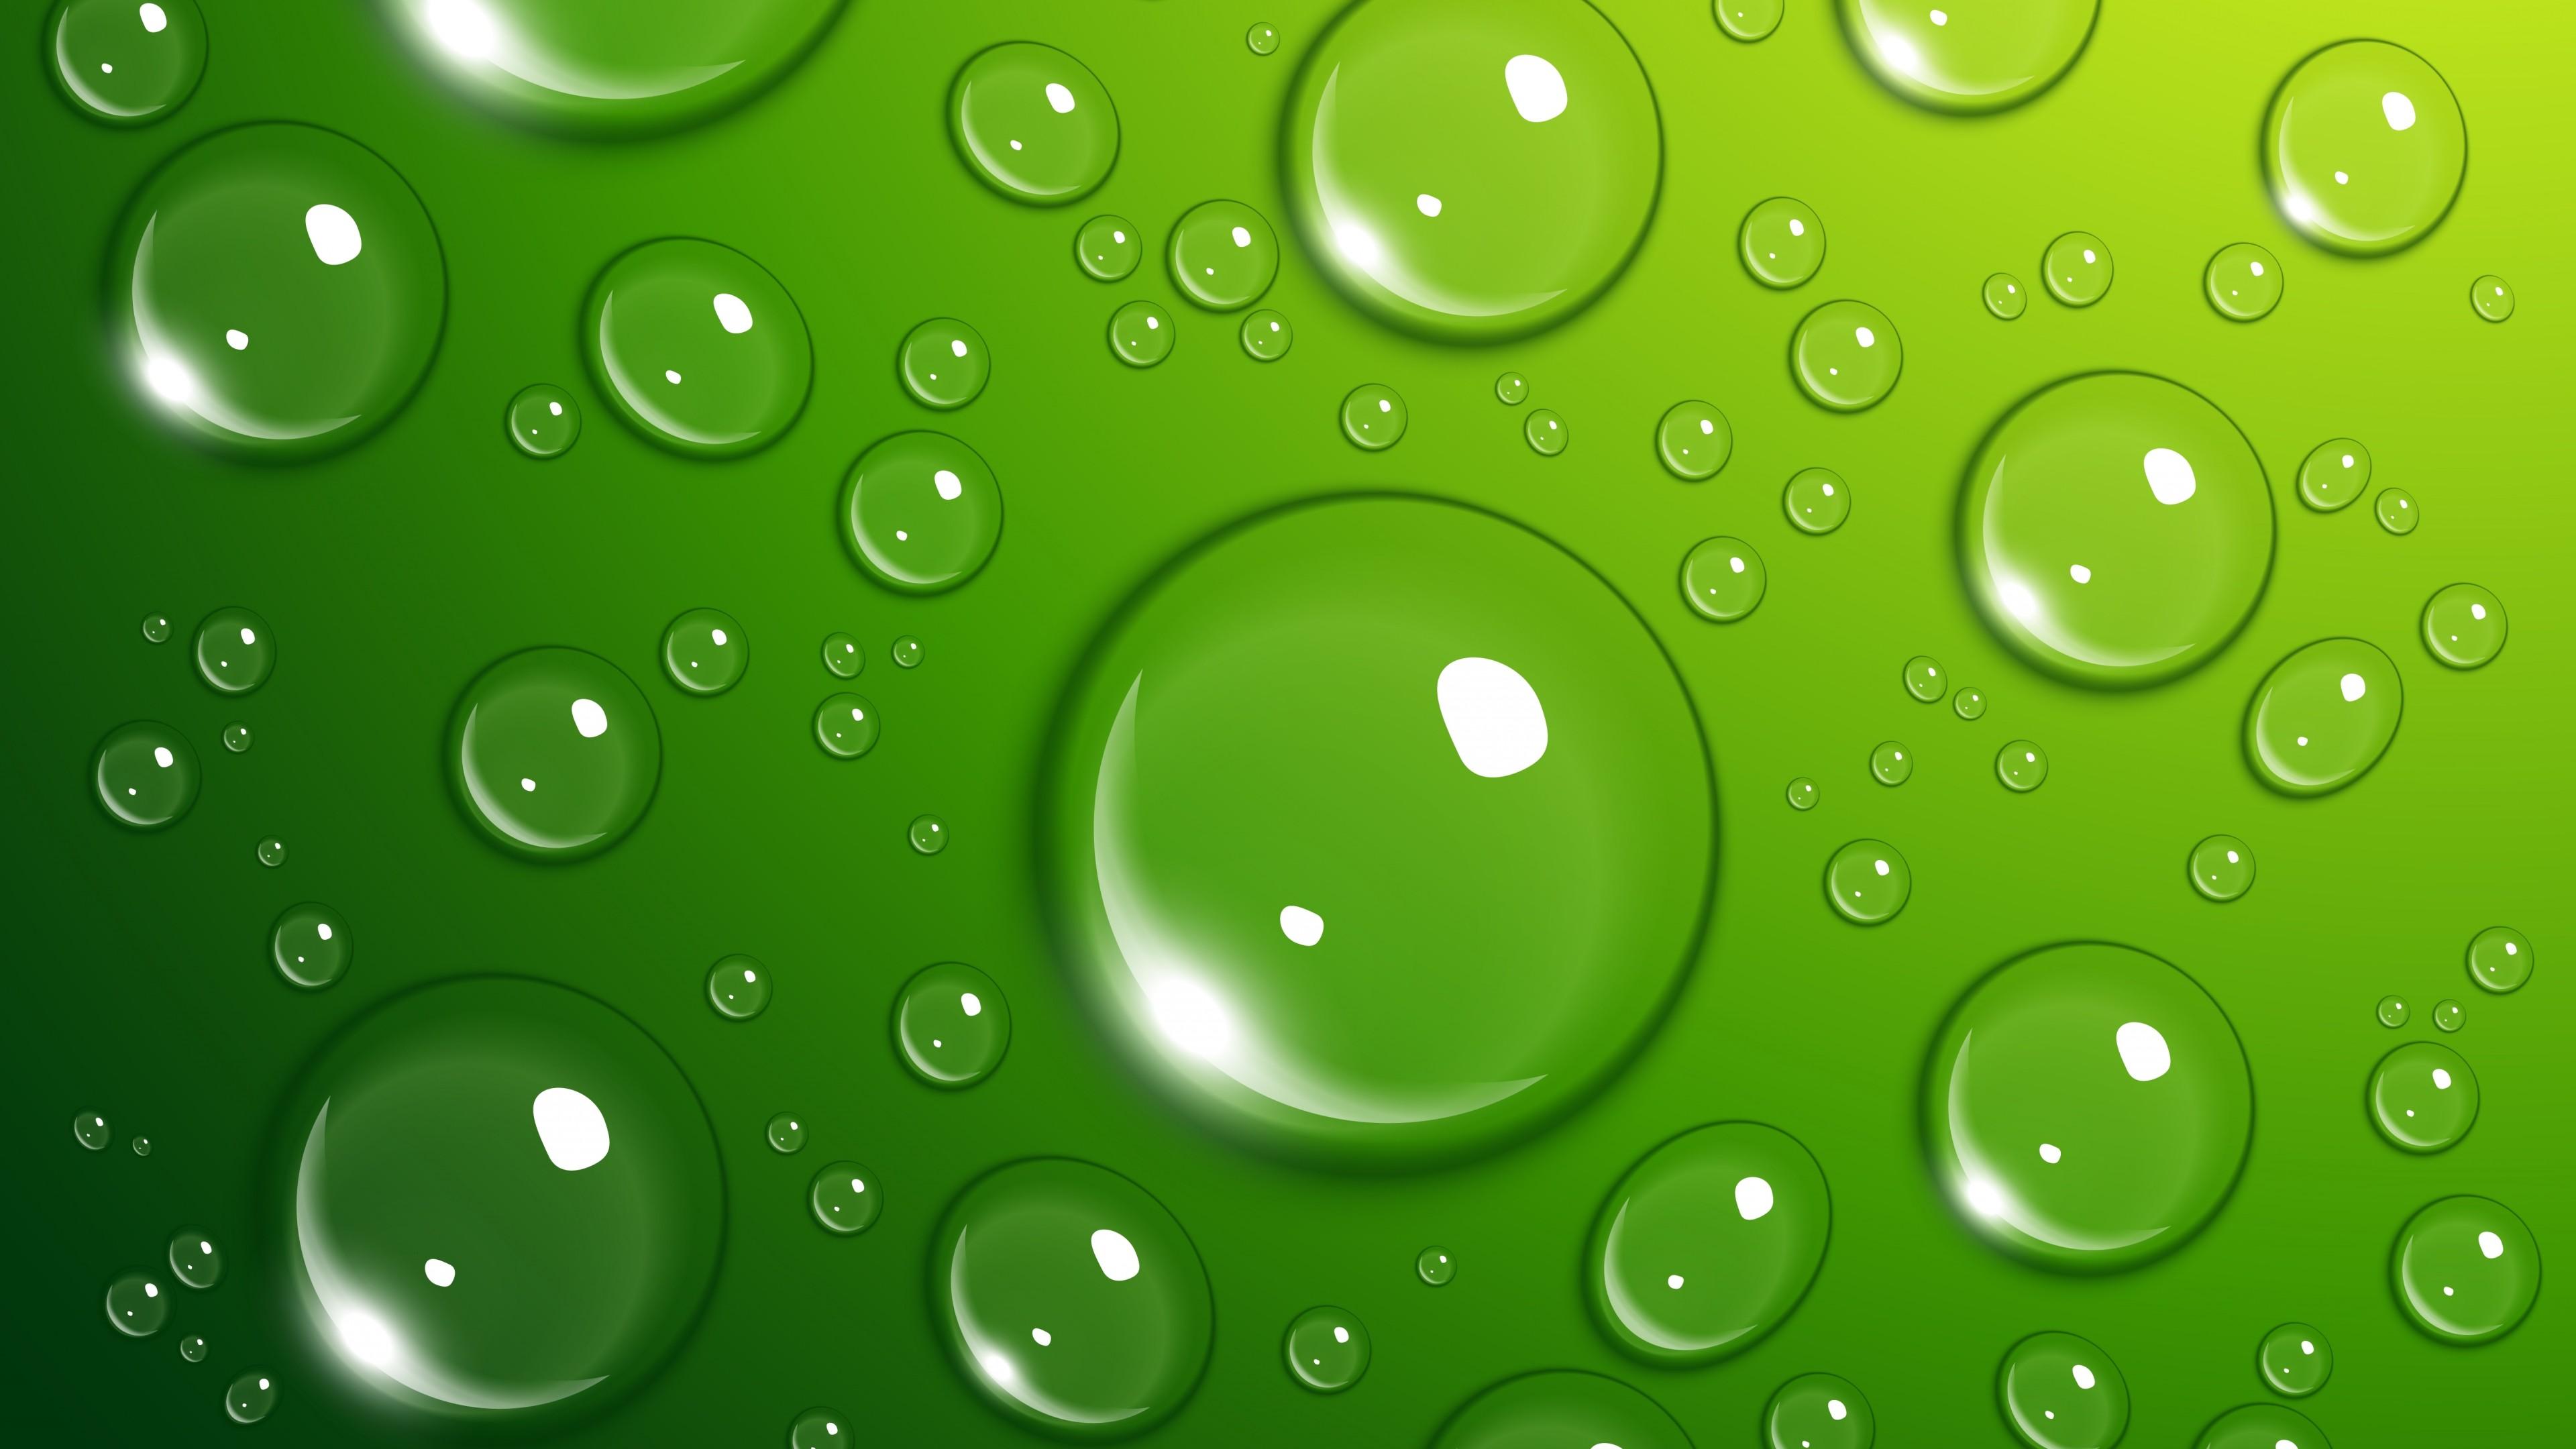 Wallpaper Drops 4k 5k Wallpaper 8k Green Water Os 557